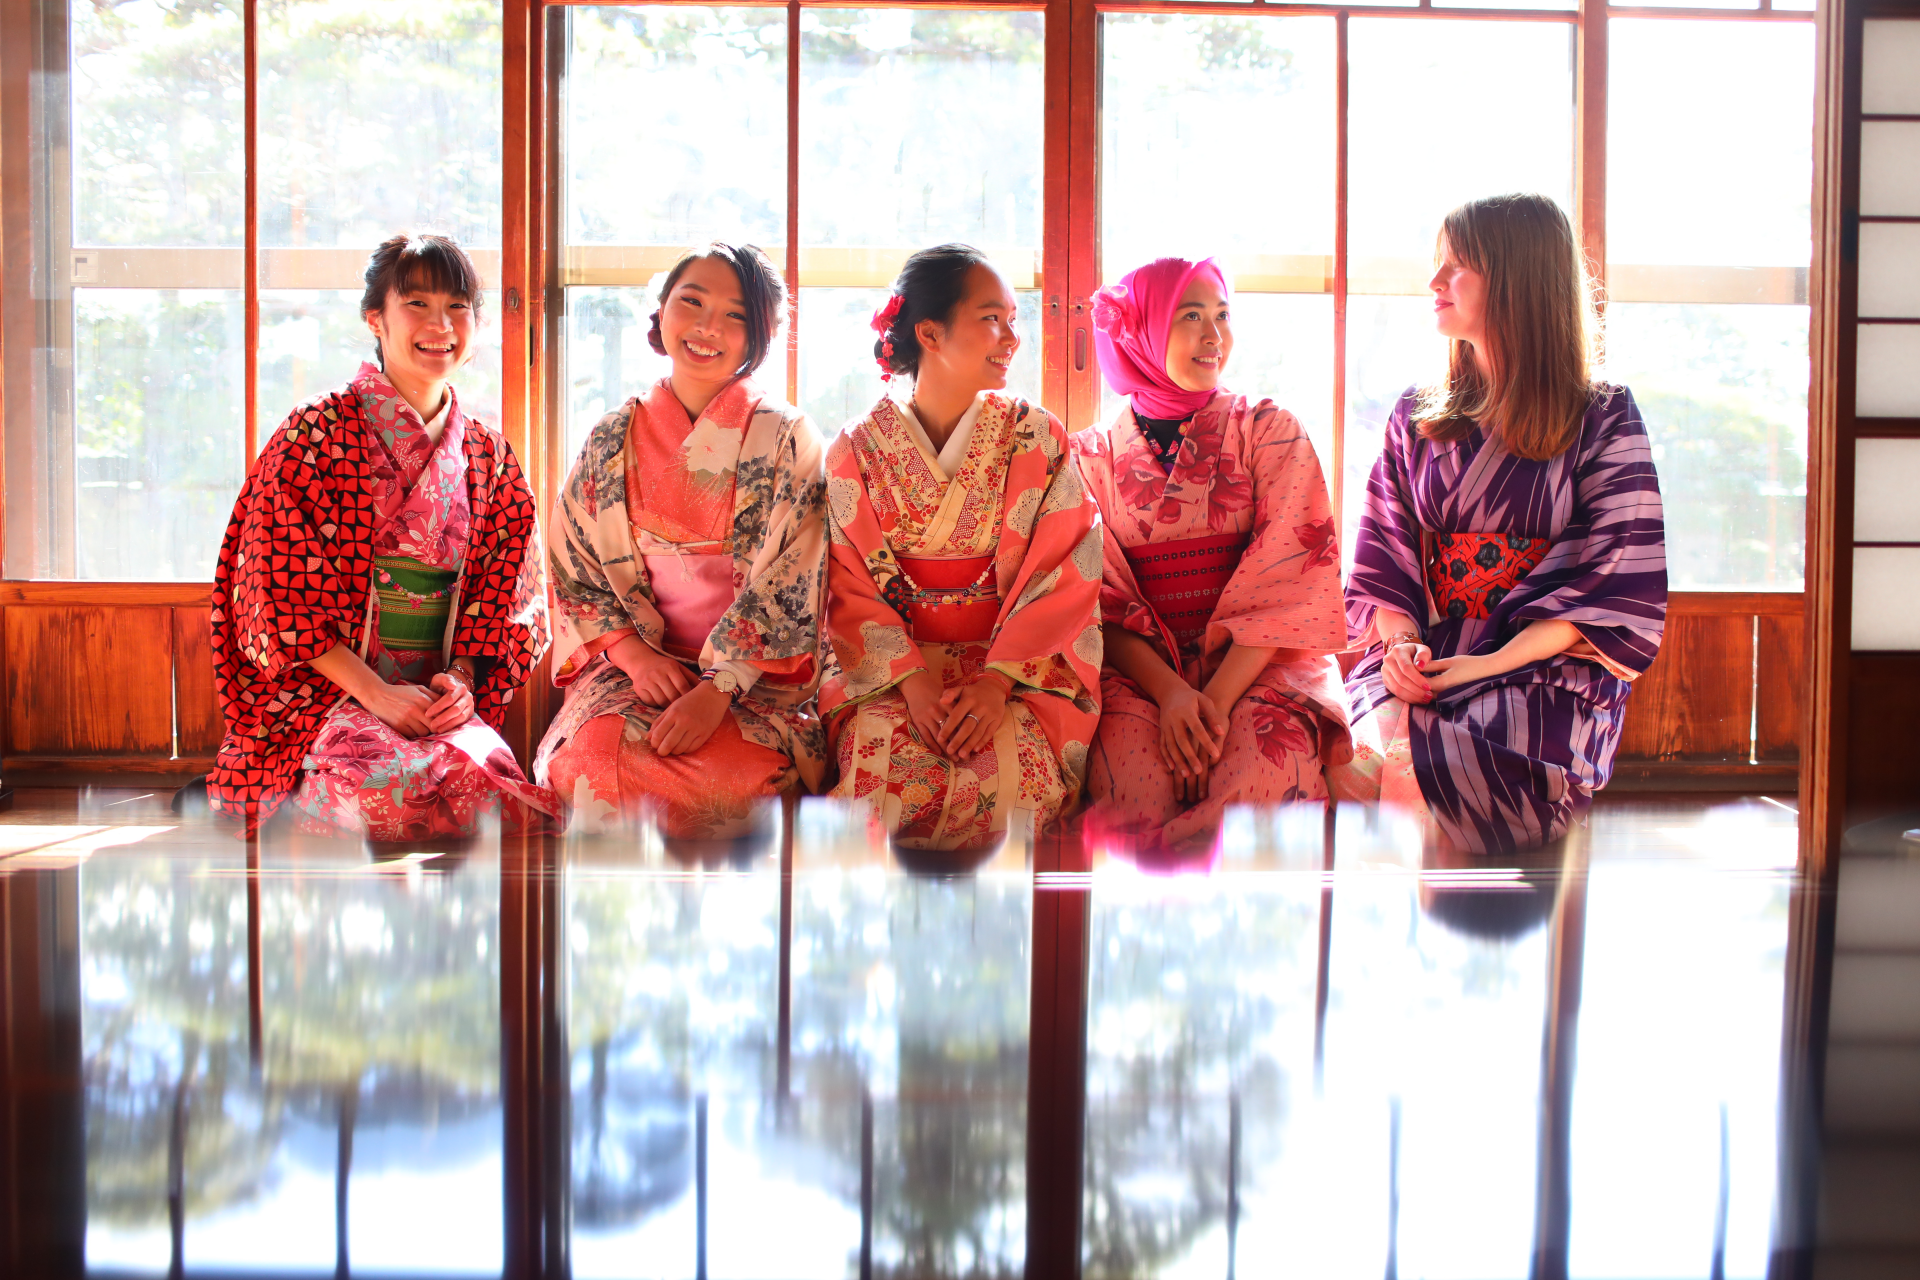 Stroll around Scenic Matsushima in a Kimono! (Rental Kimono Plan)